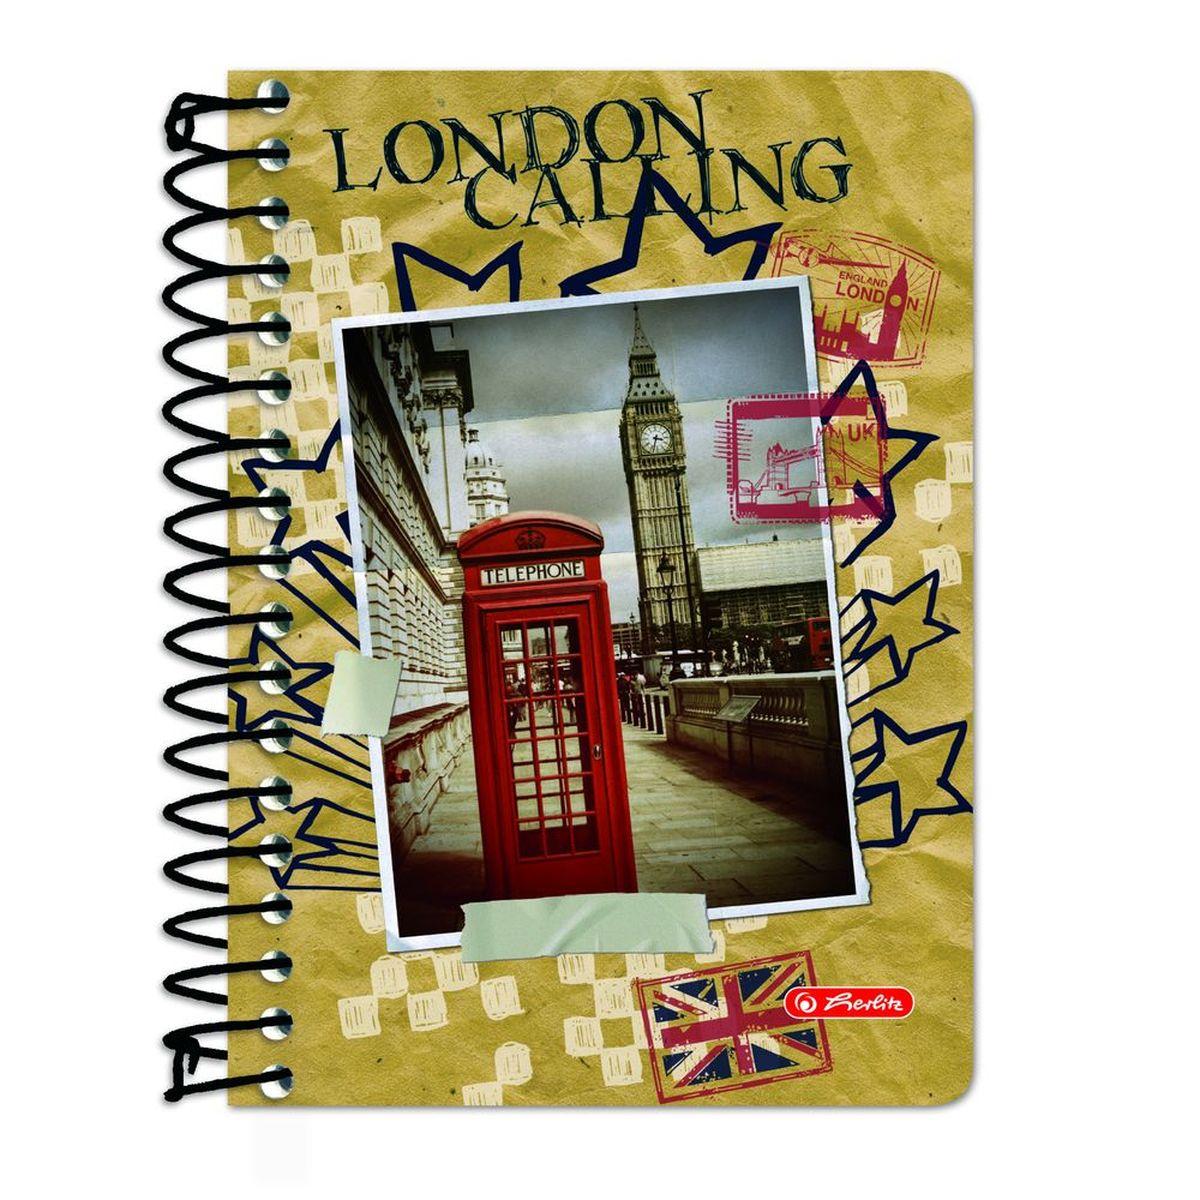 Herlitz Блокнот City Trips London 200 листов в клетку santoro london блокнот we can all shine 300 листов